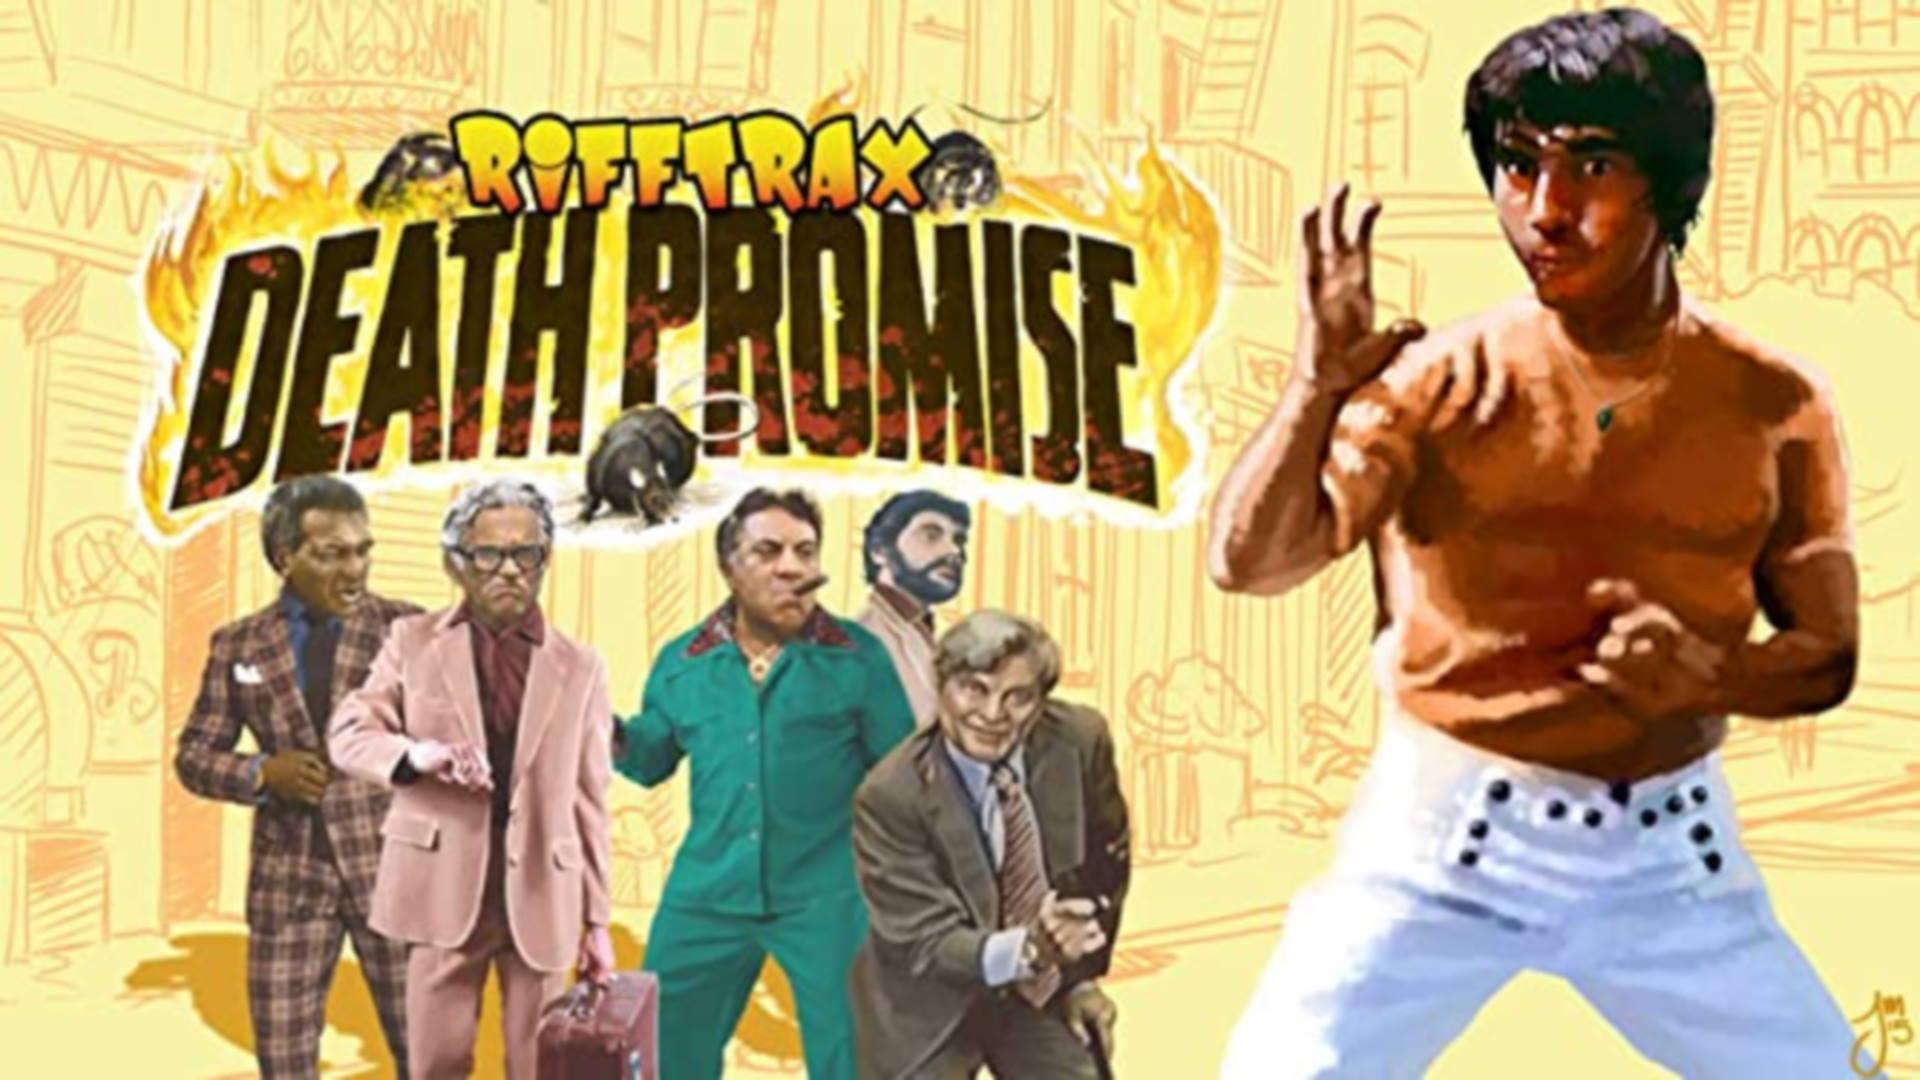 RiffTrax: Death Promise